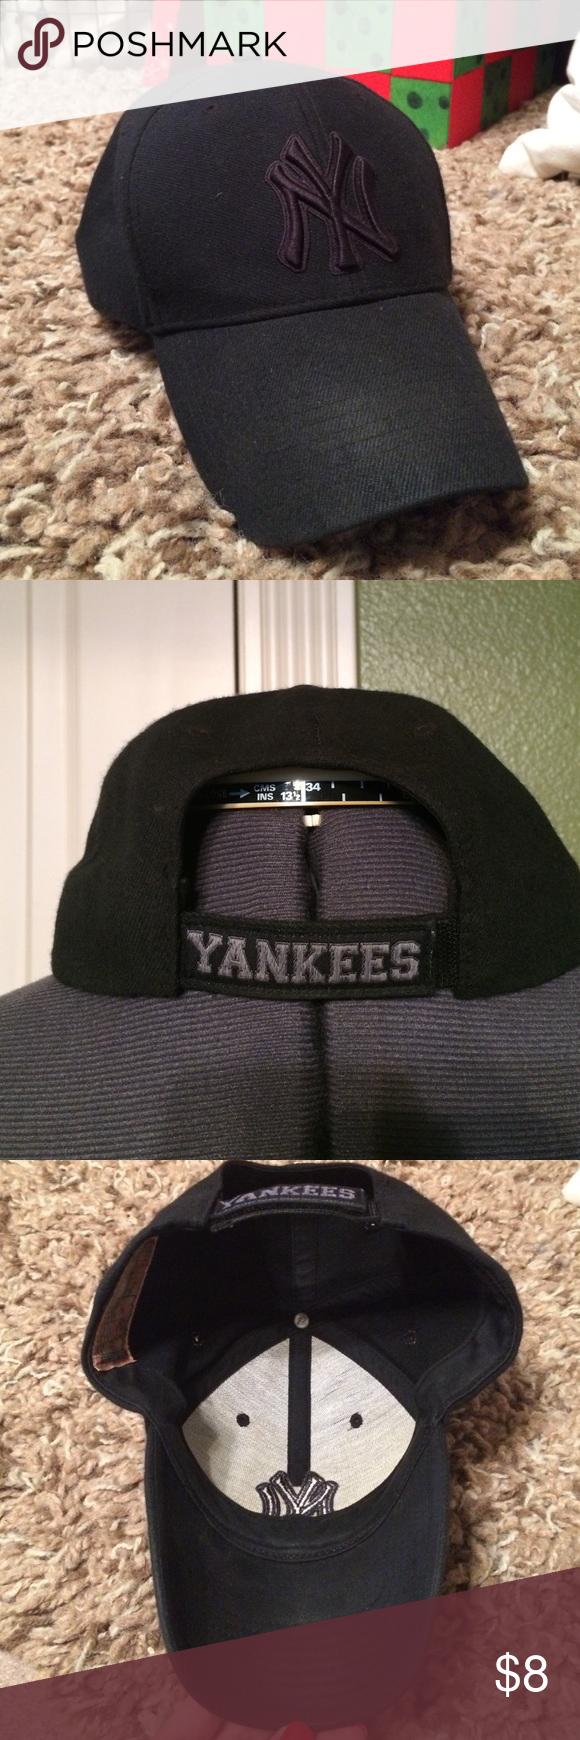 NY Yankees Cap Adjustable Velcro band. MLB Accessories Hats